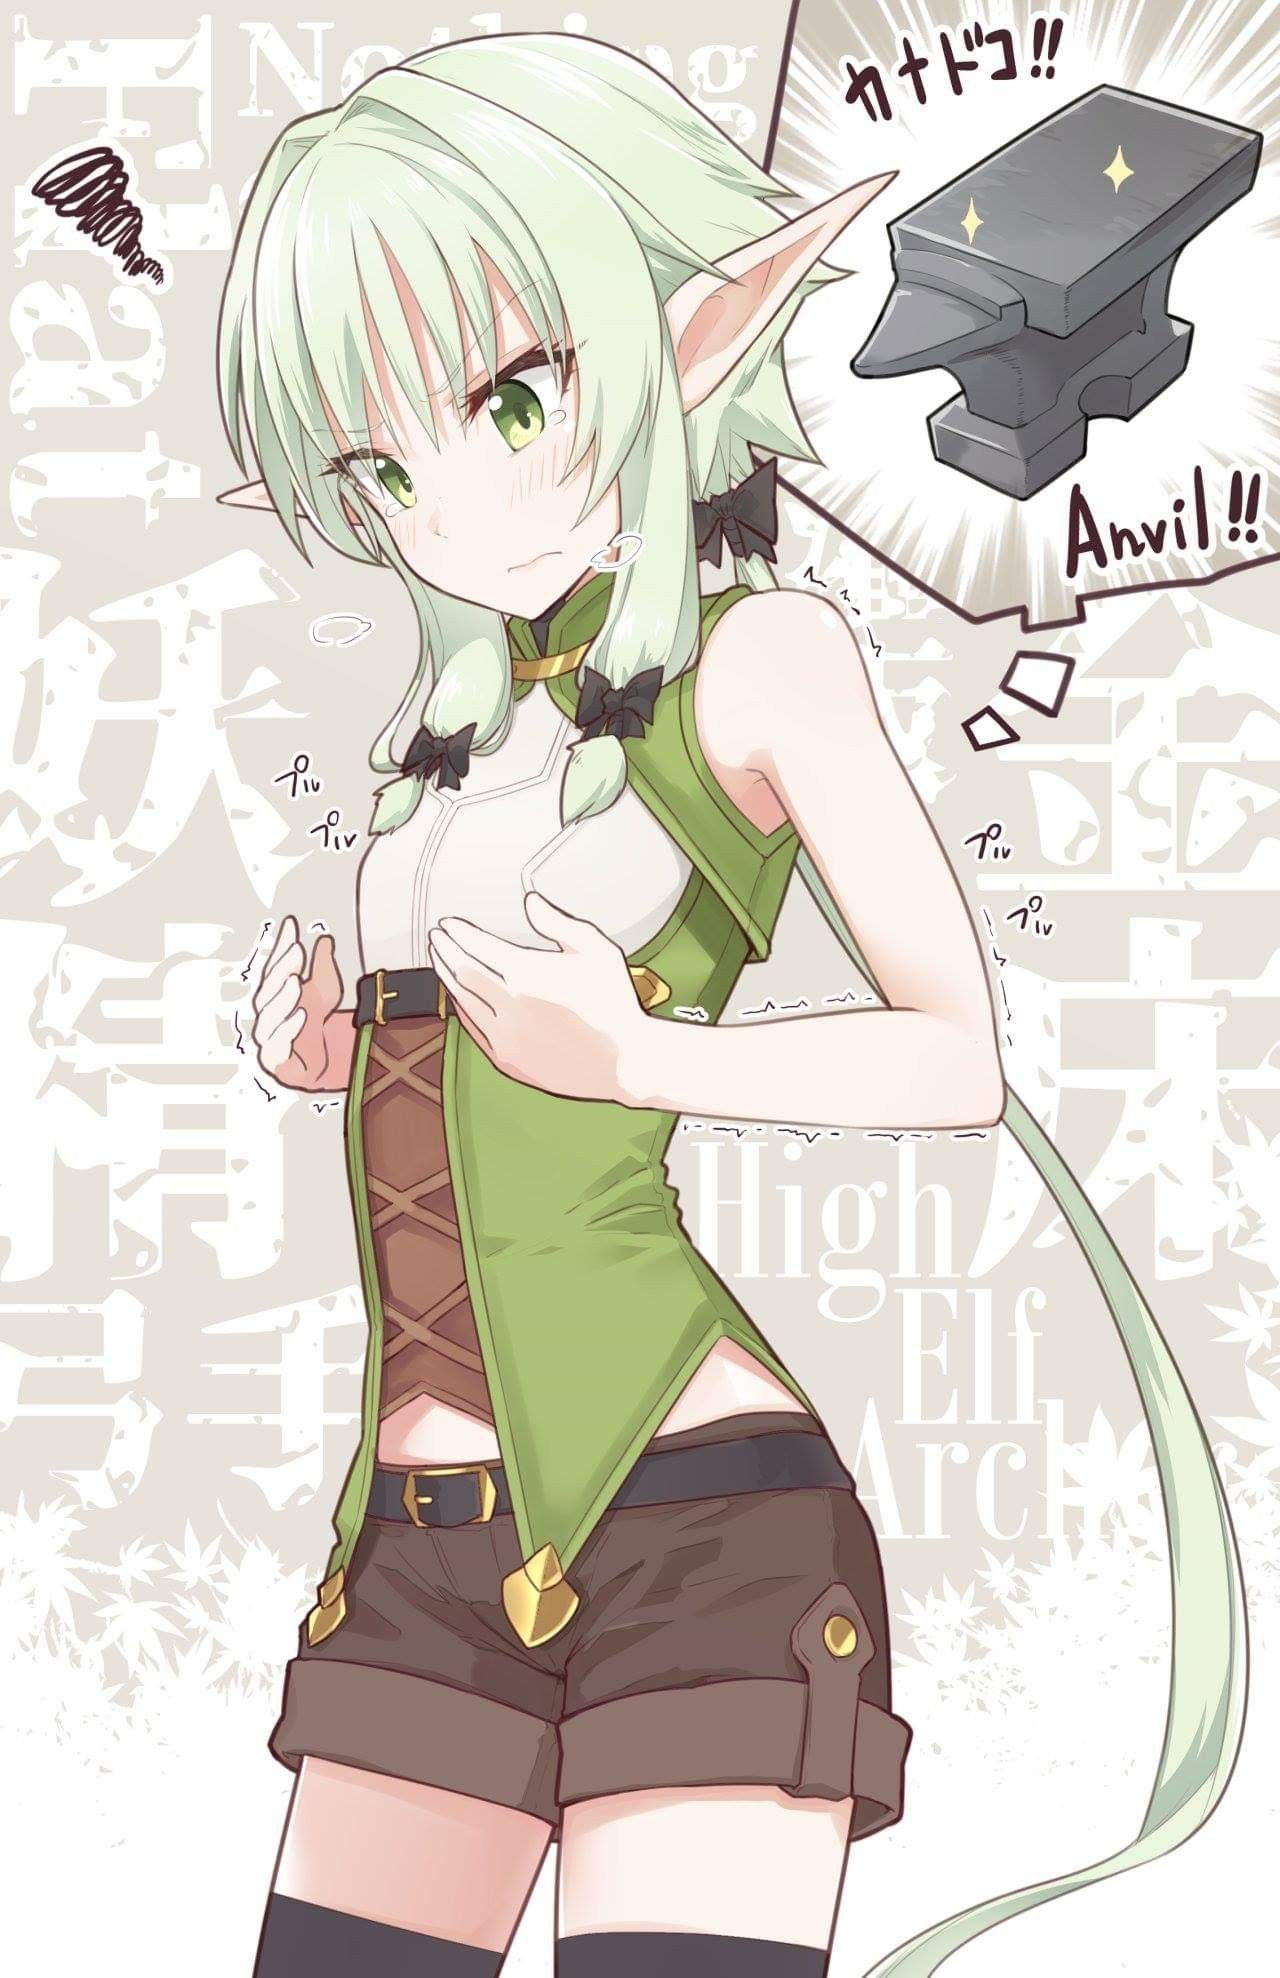 Flat As Anvil With Images Anime Elf Anime Otaku Anime